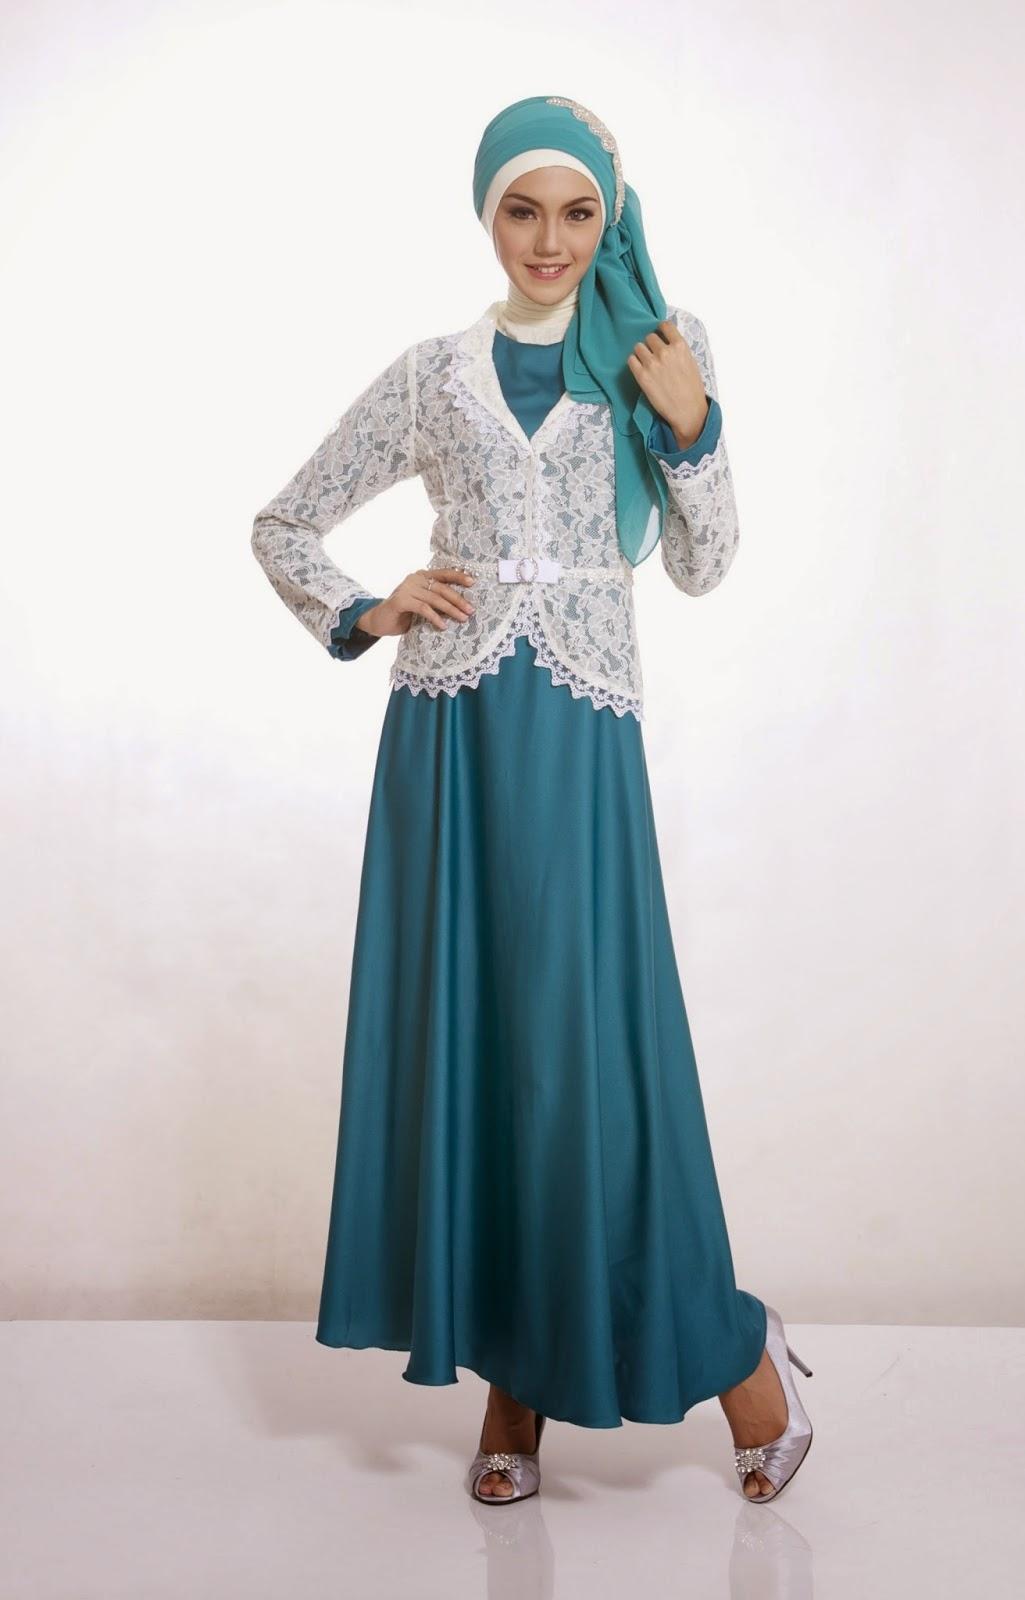 gaun pesta muslim biru terbaru